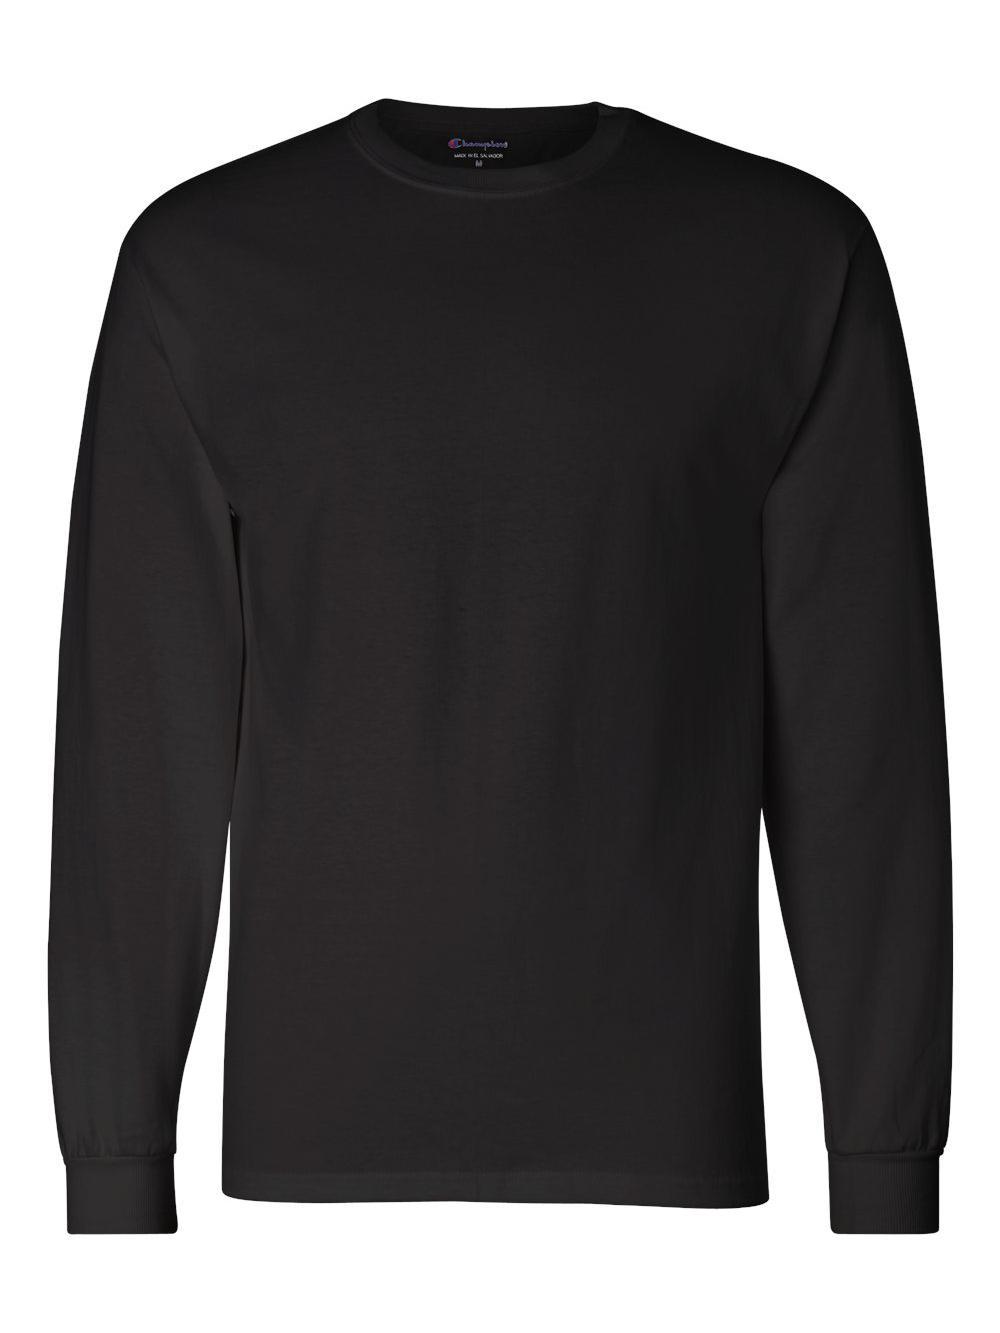 Champion-Long-Sleeve-T-Shirt-CC8C thumbnail 3